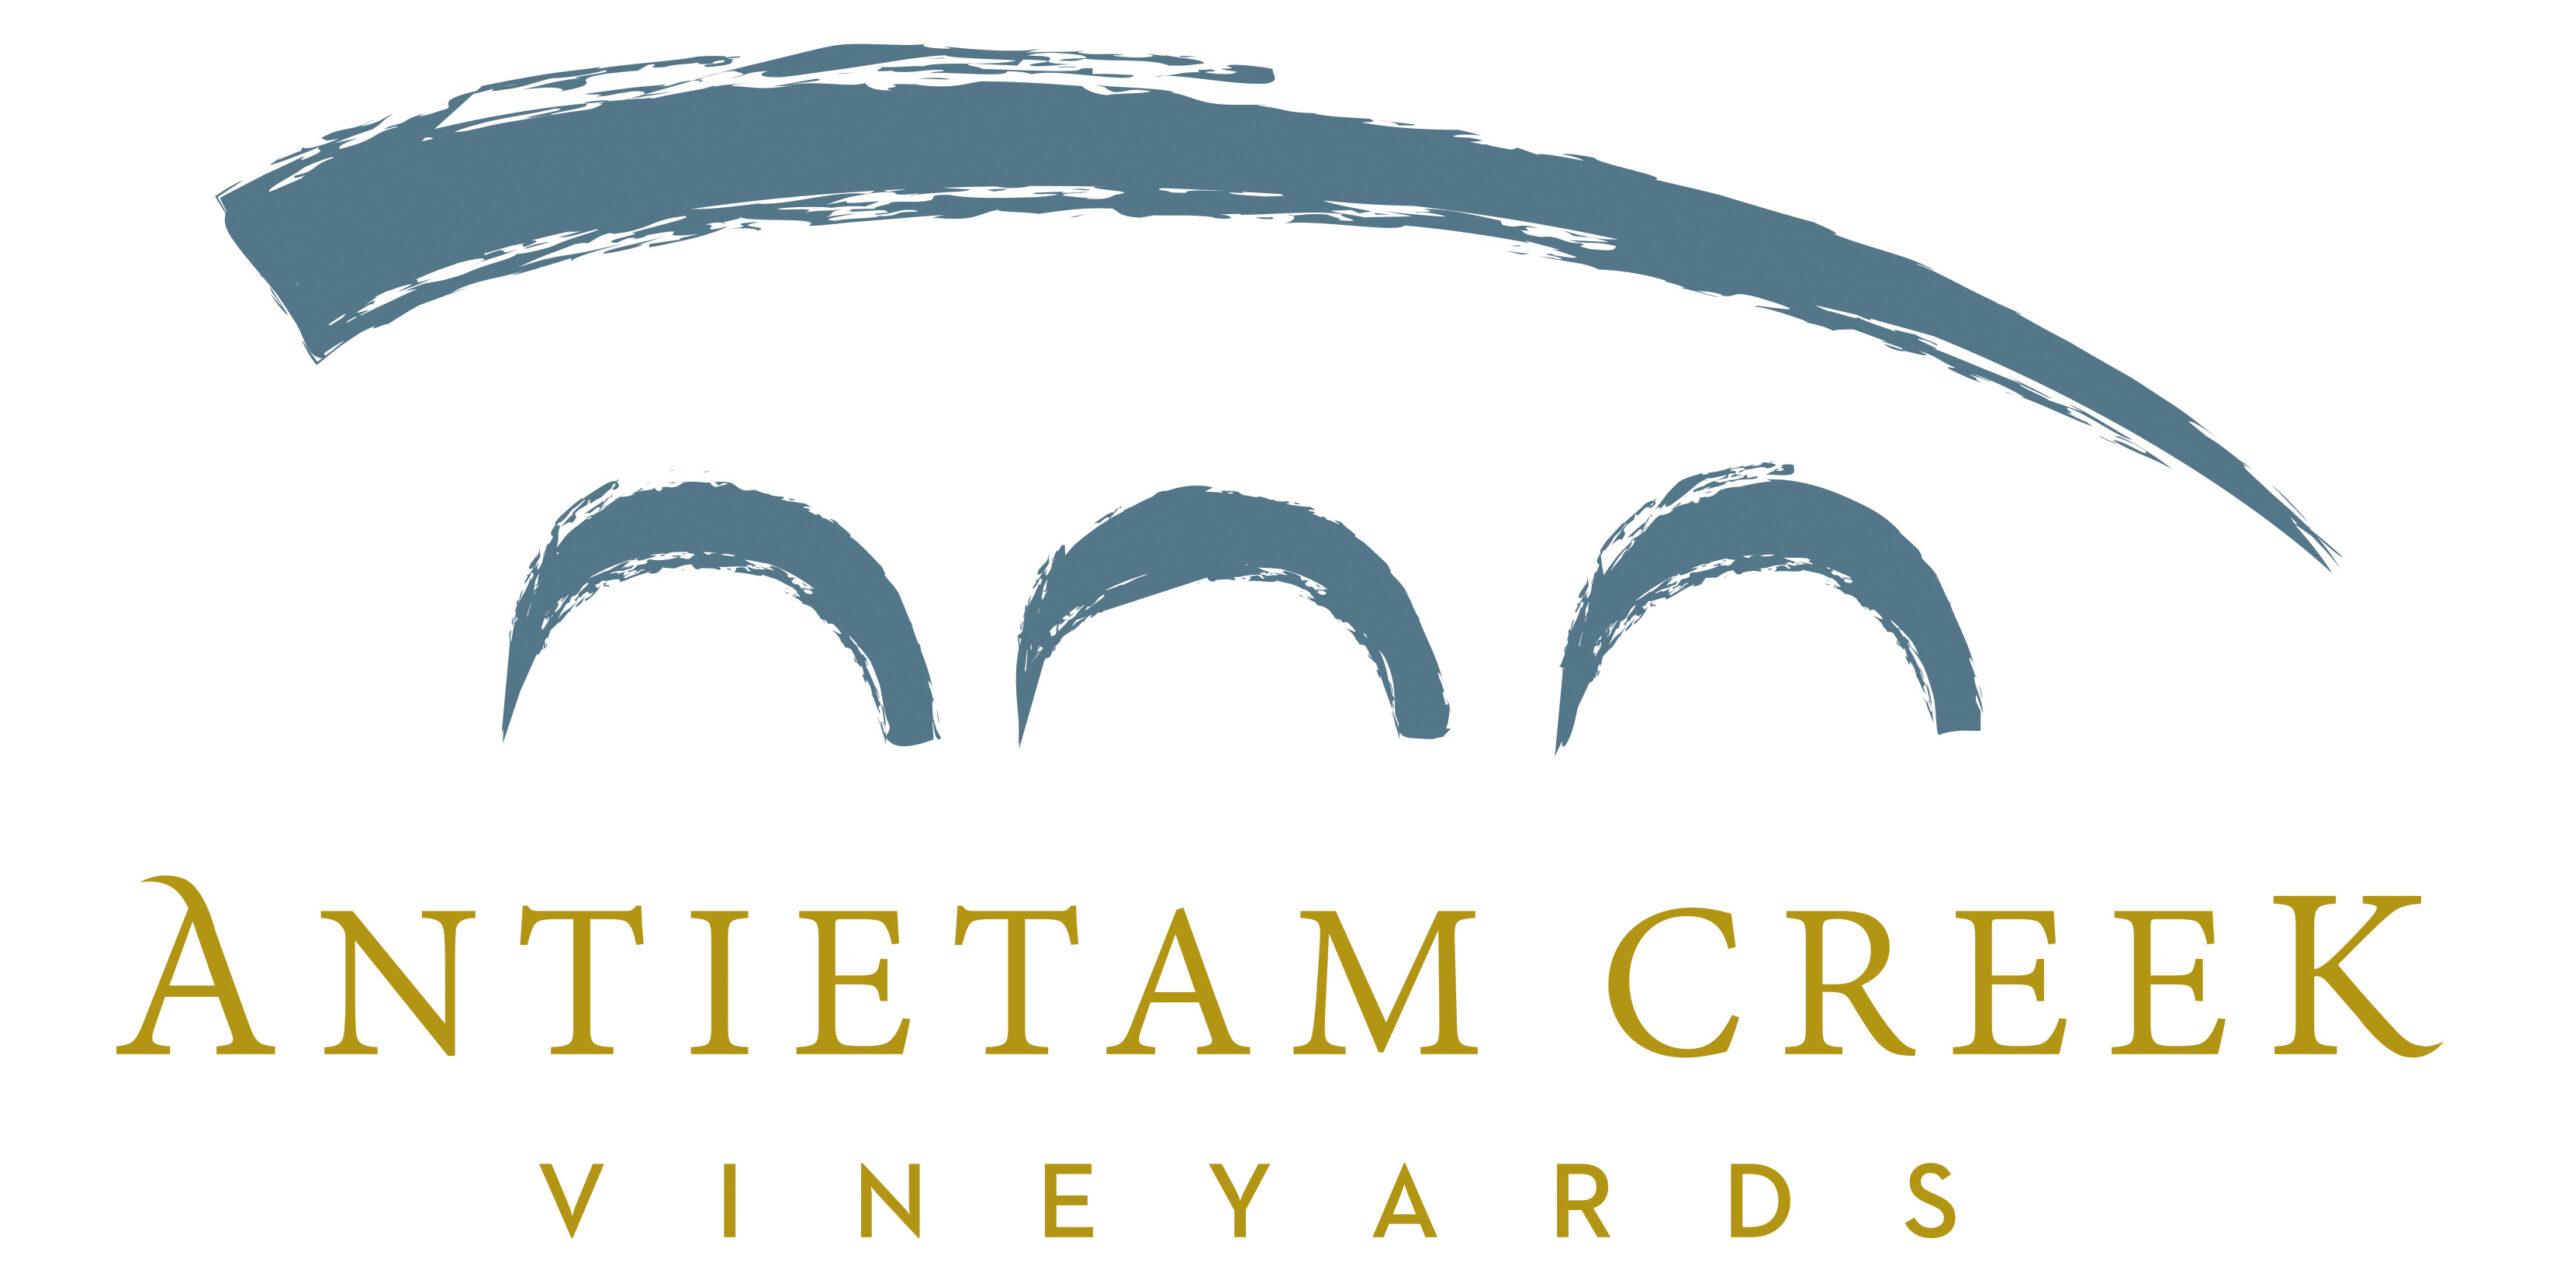 Antietam Creek Vineyards